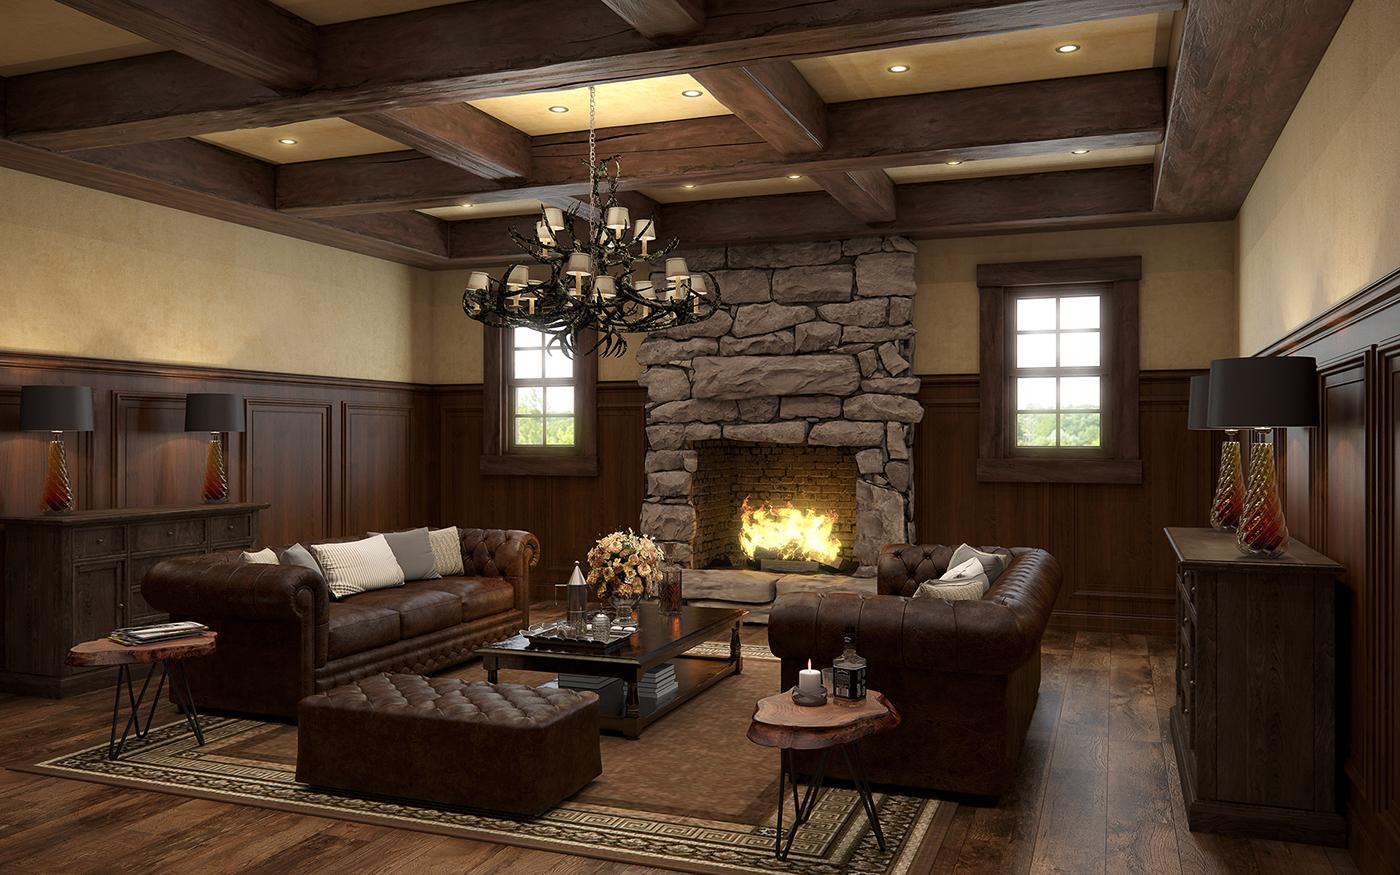 Interior Renderings visualization